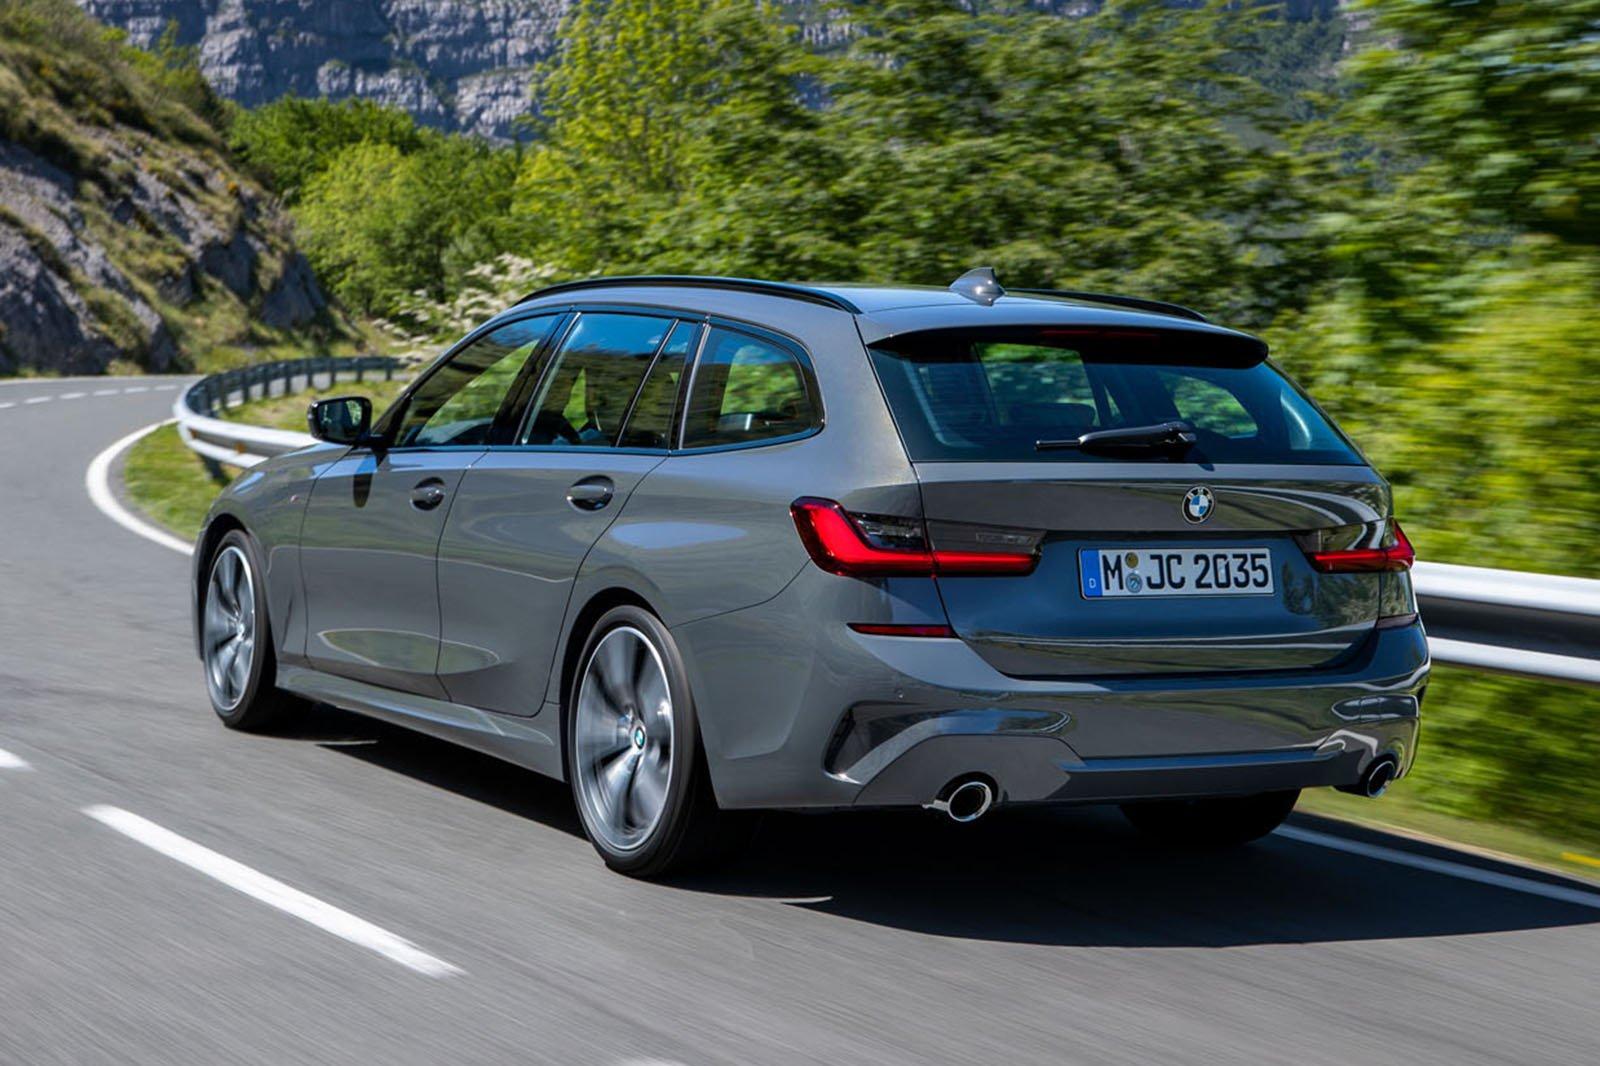 2019 BMW 3 Series Touring rear